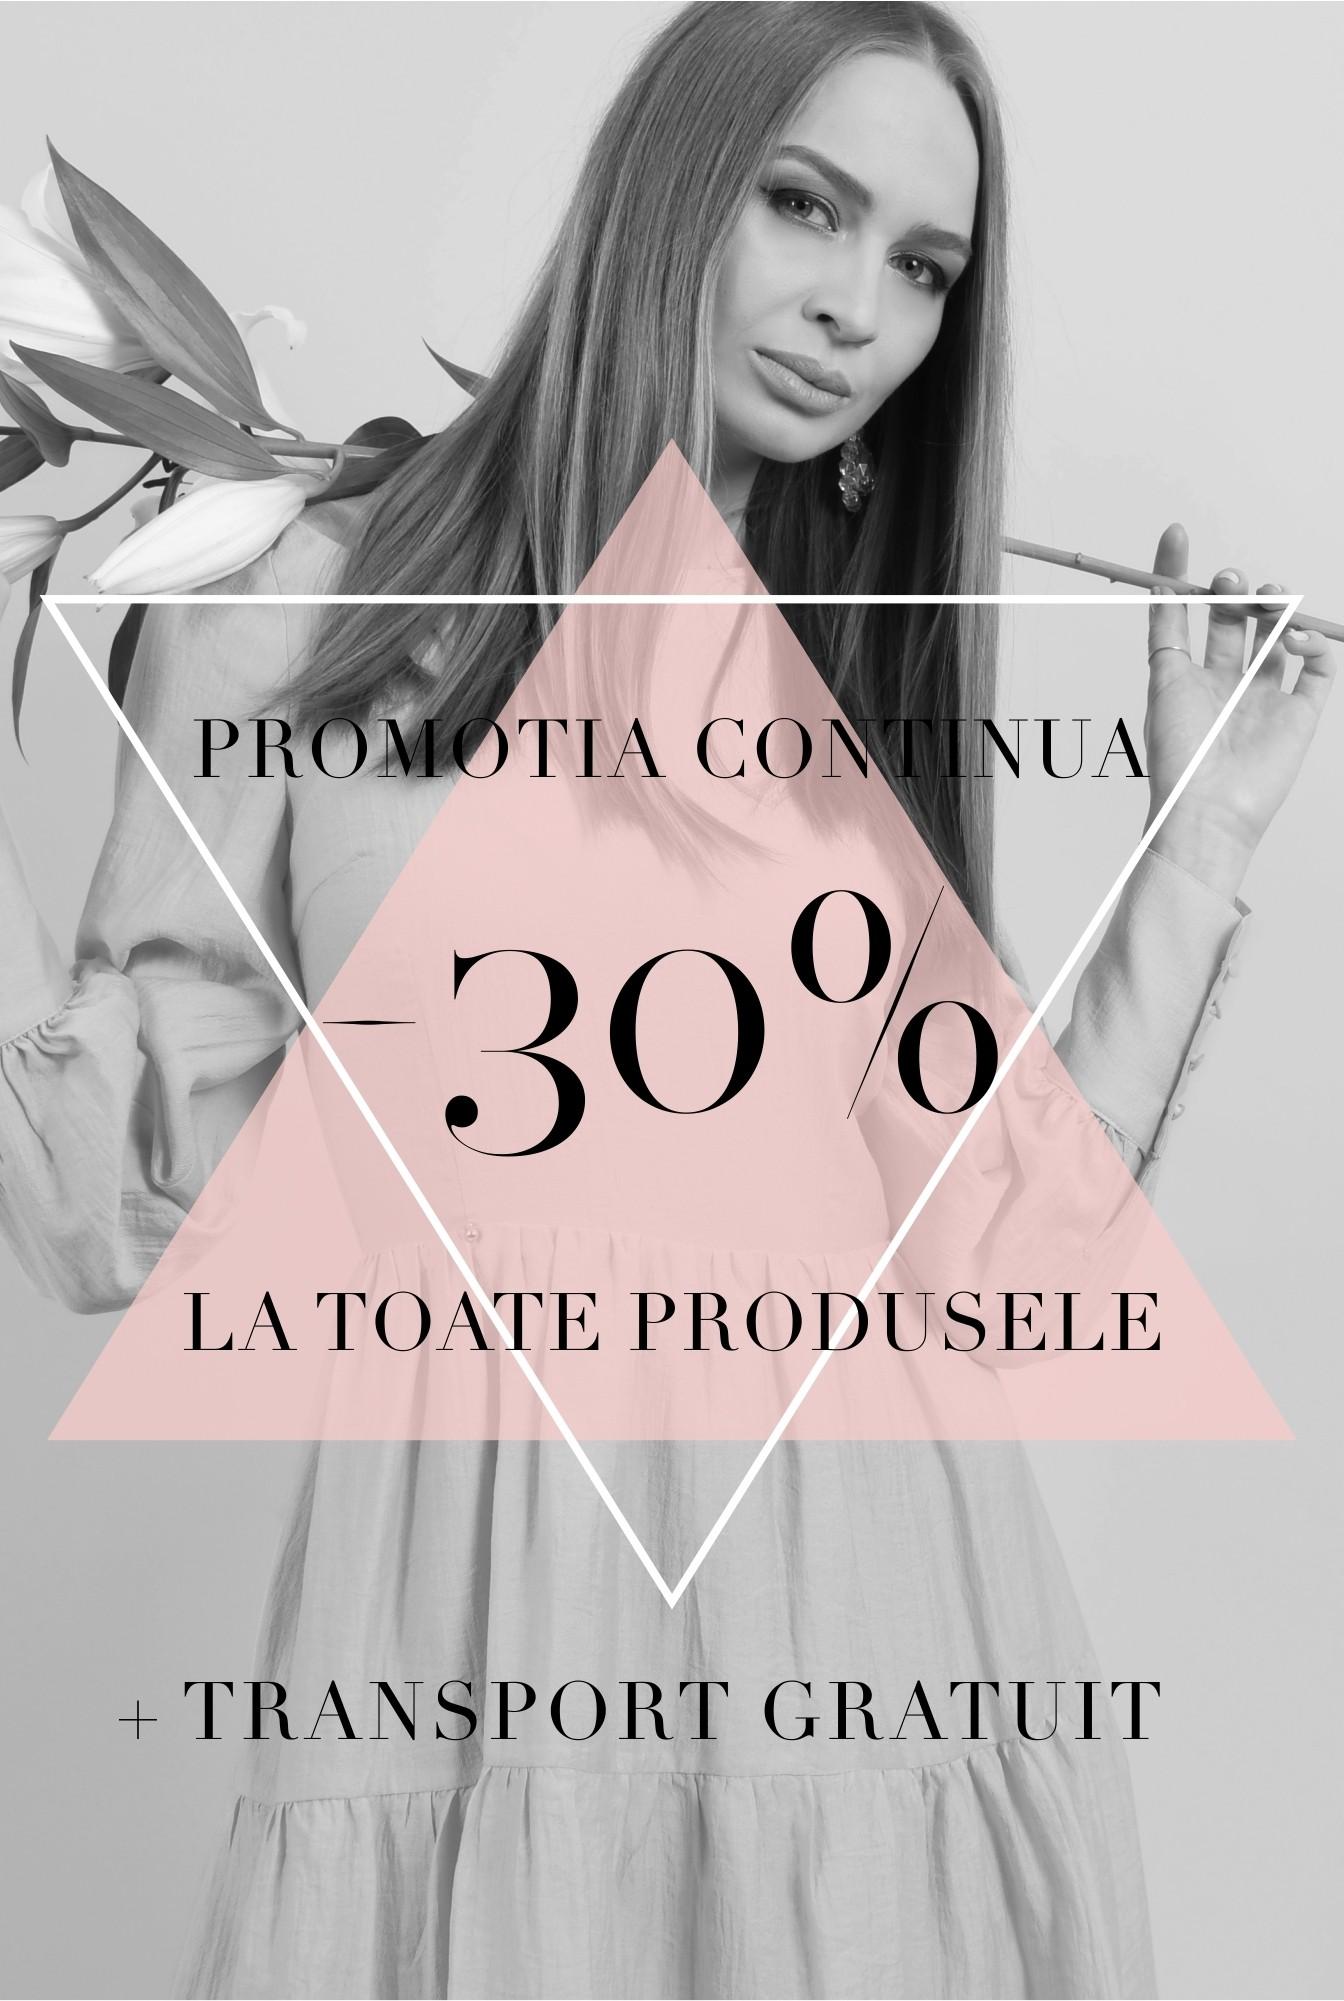 0 - #staysafe #buyonline: -30% la toate produsele POEMA